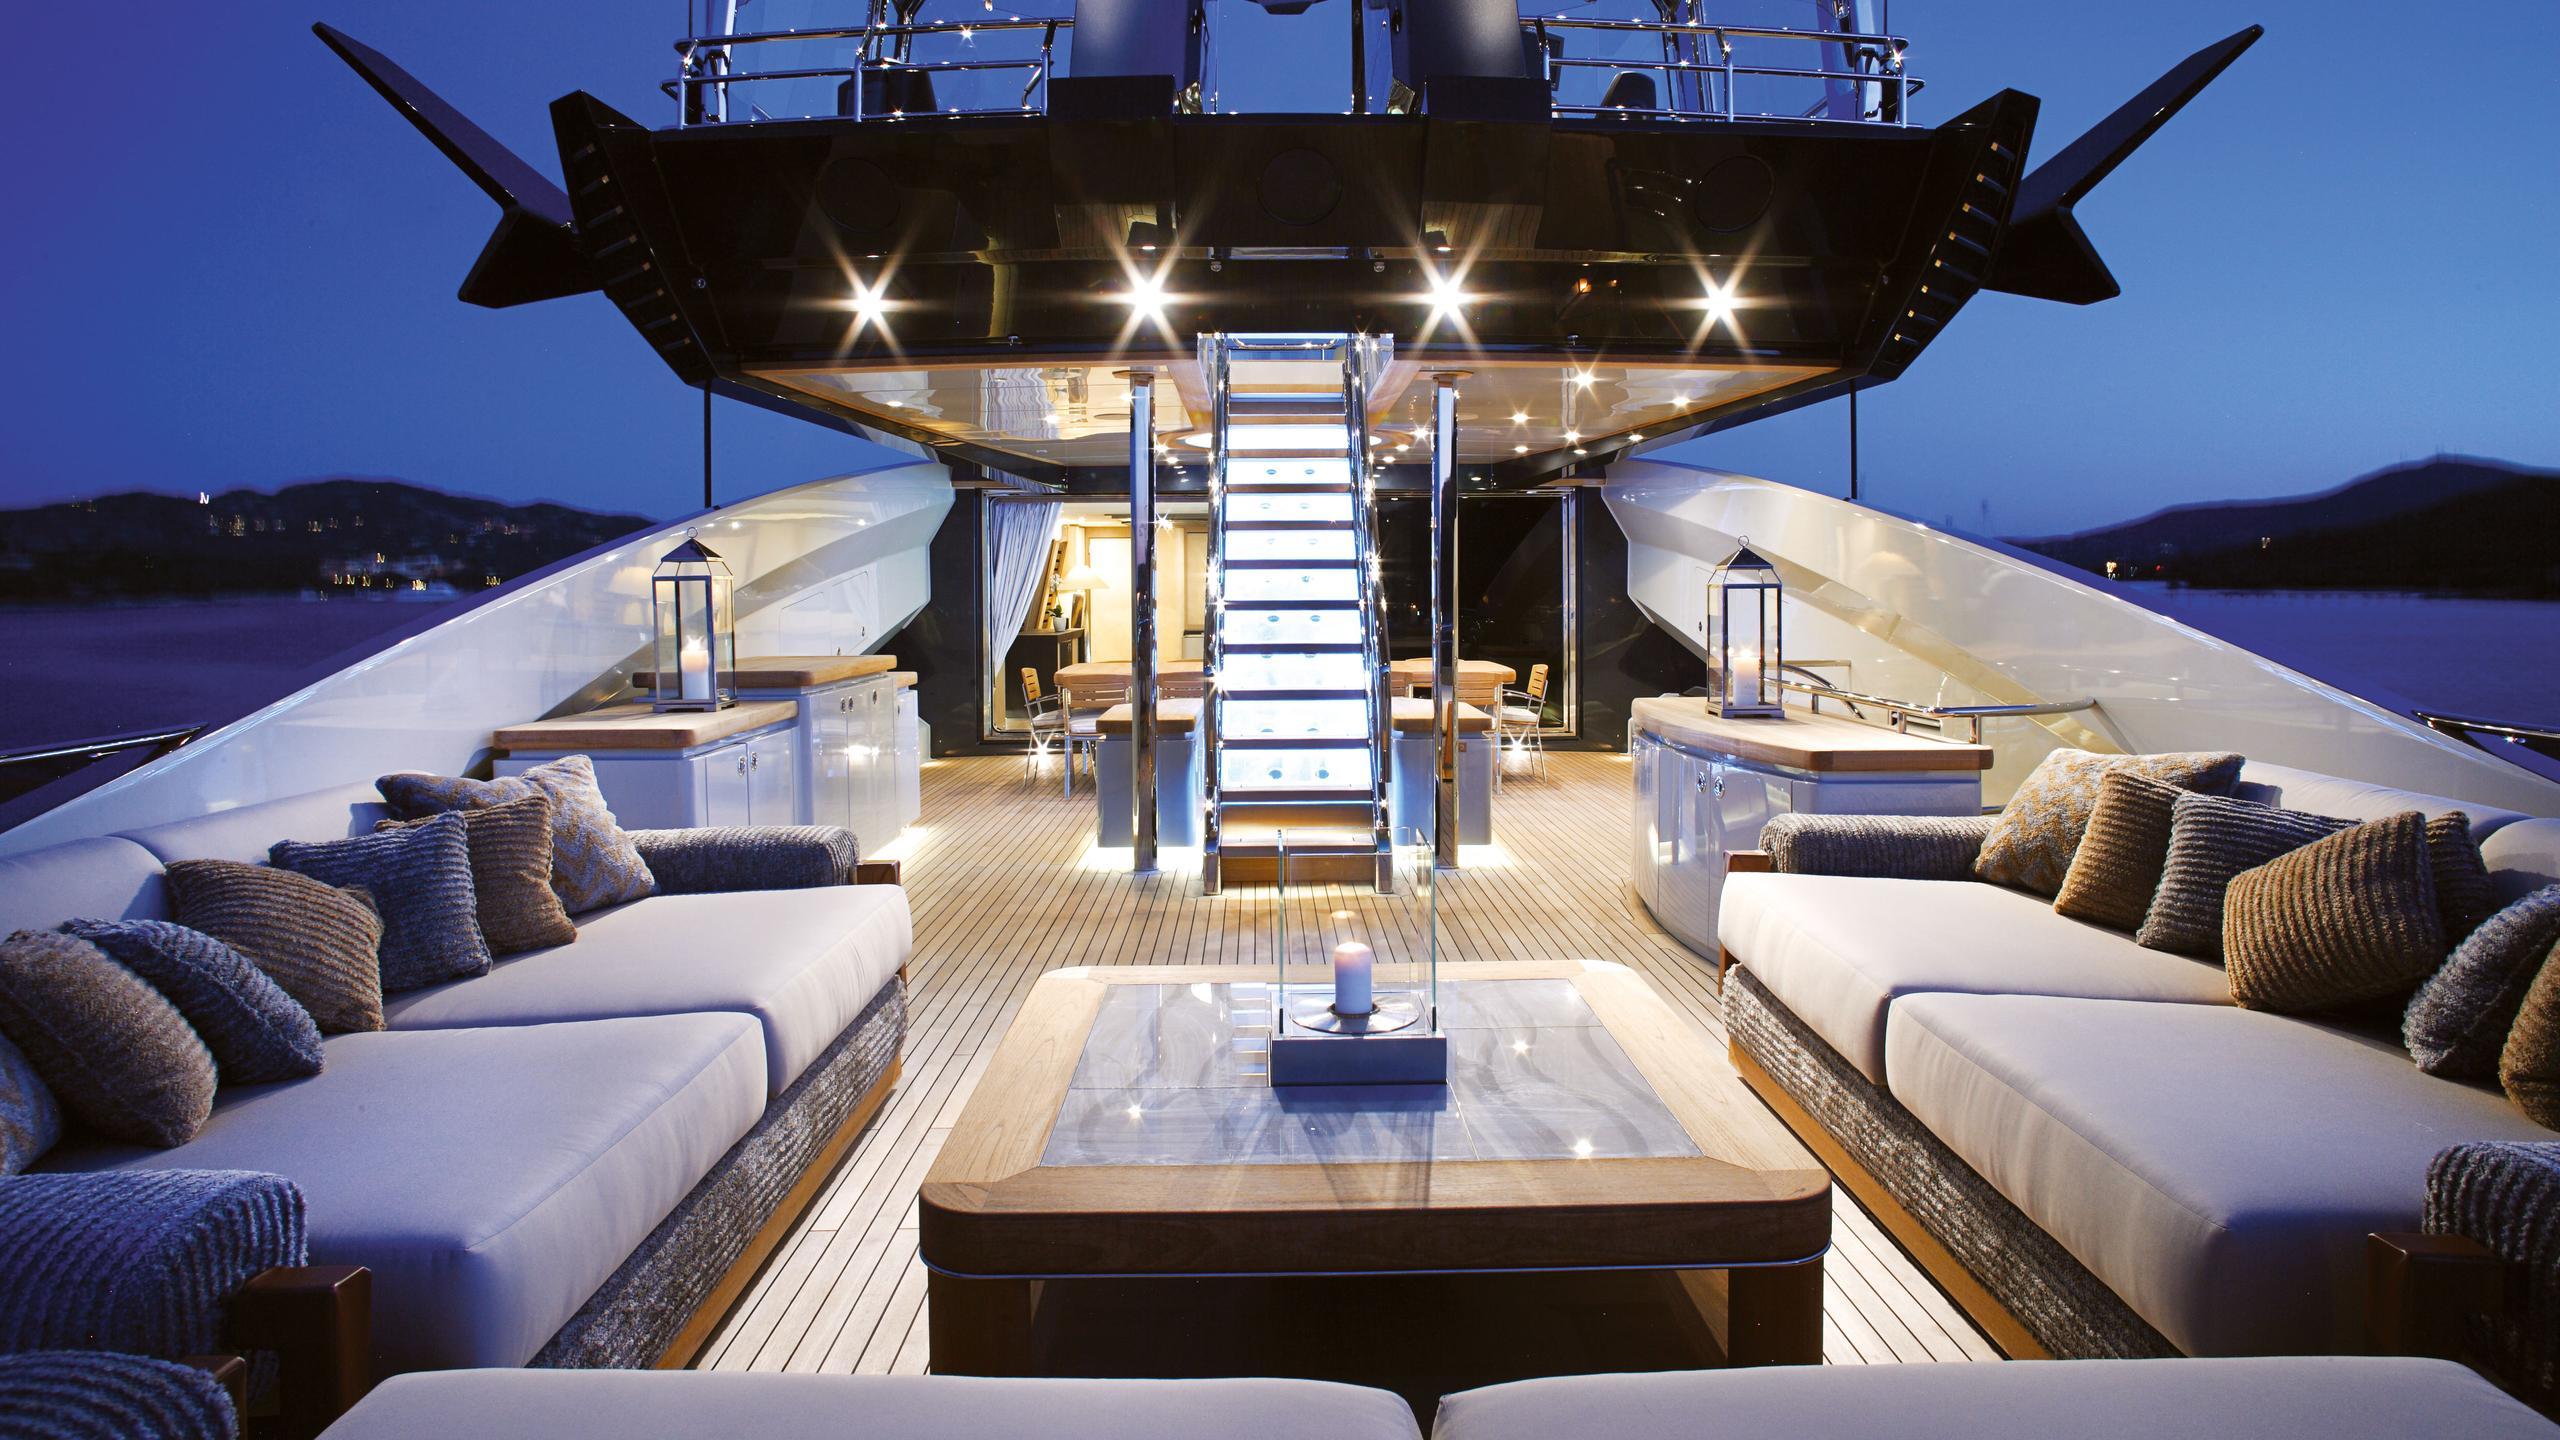 lady-m-motor-yacht-palmer-johnson-2013-64m-bridge-deck